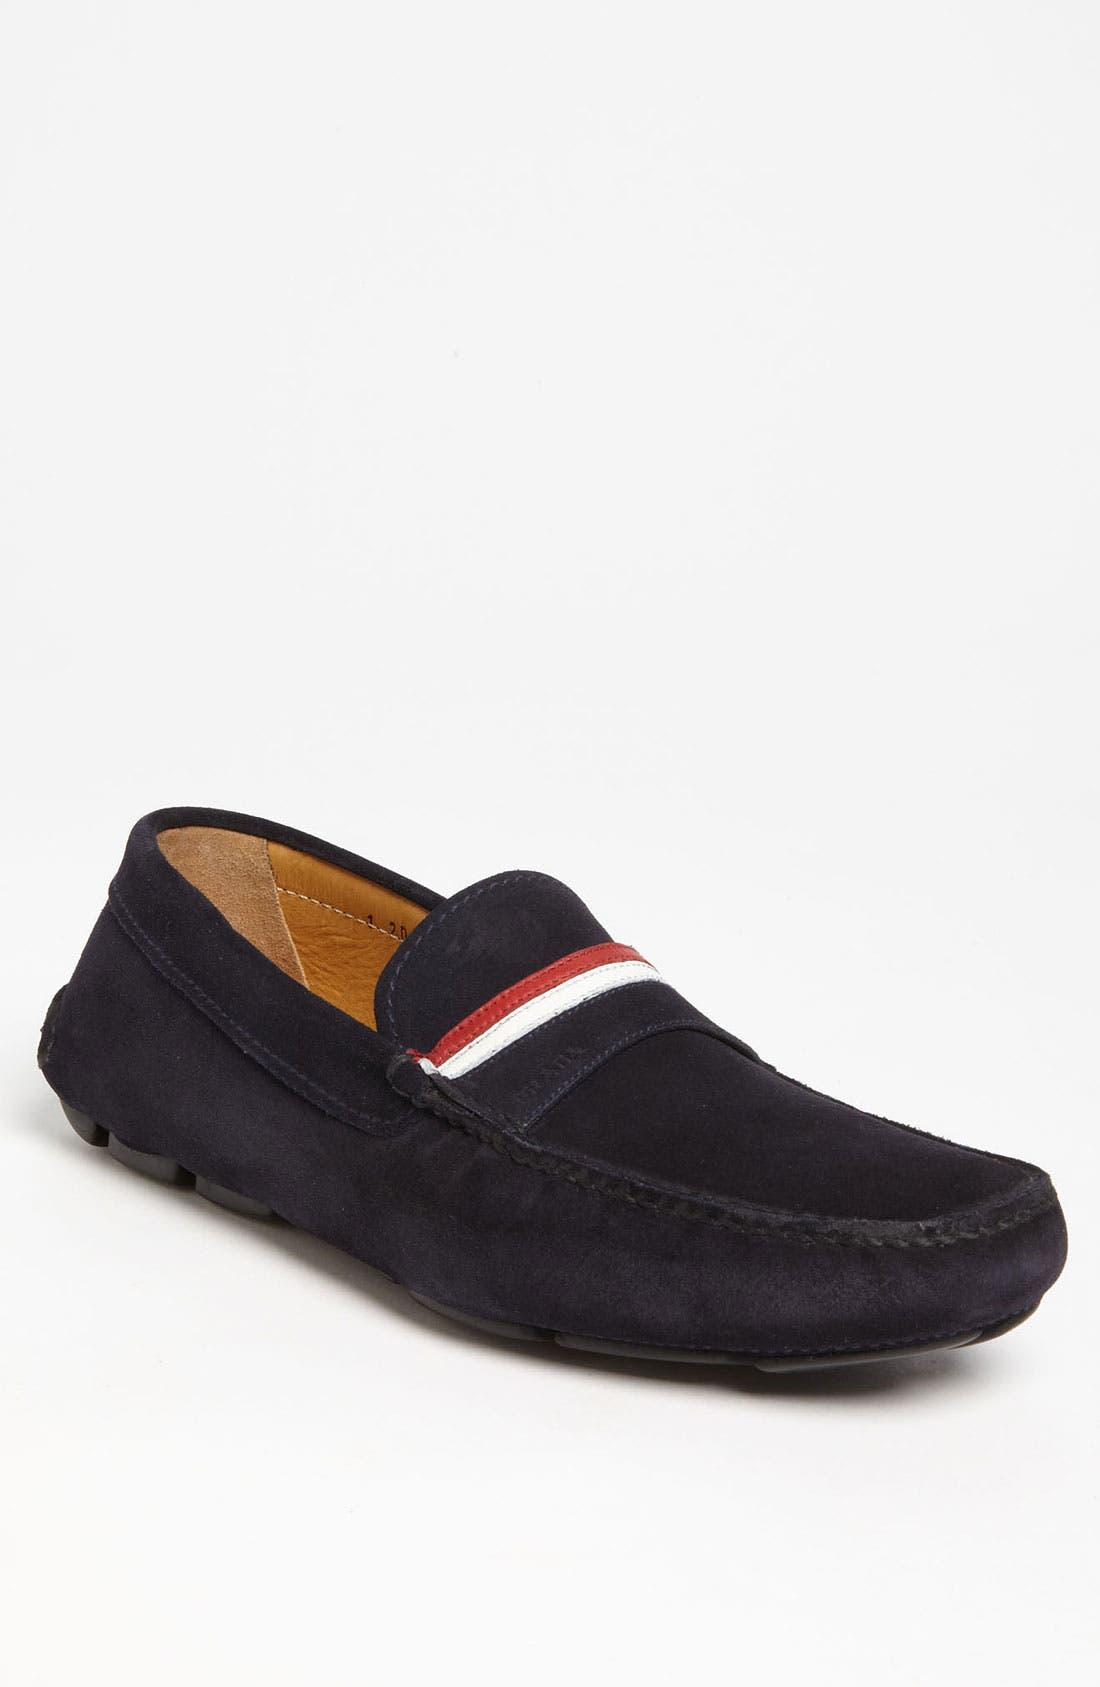 Alternate Image 1 Selected - Prada Suede Driving Shoe